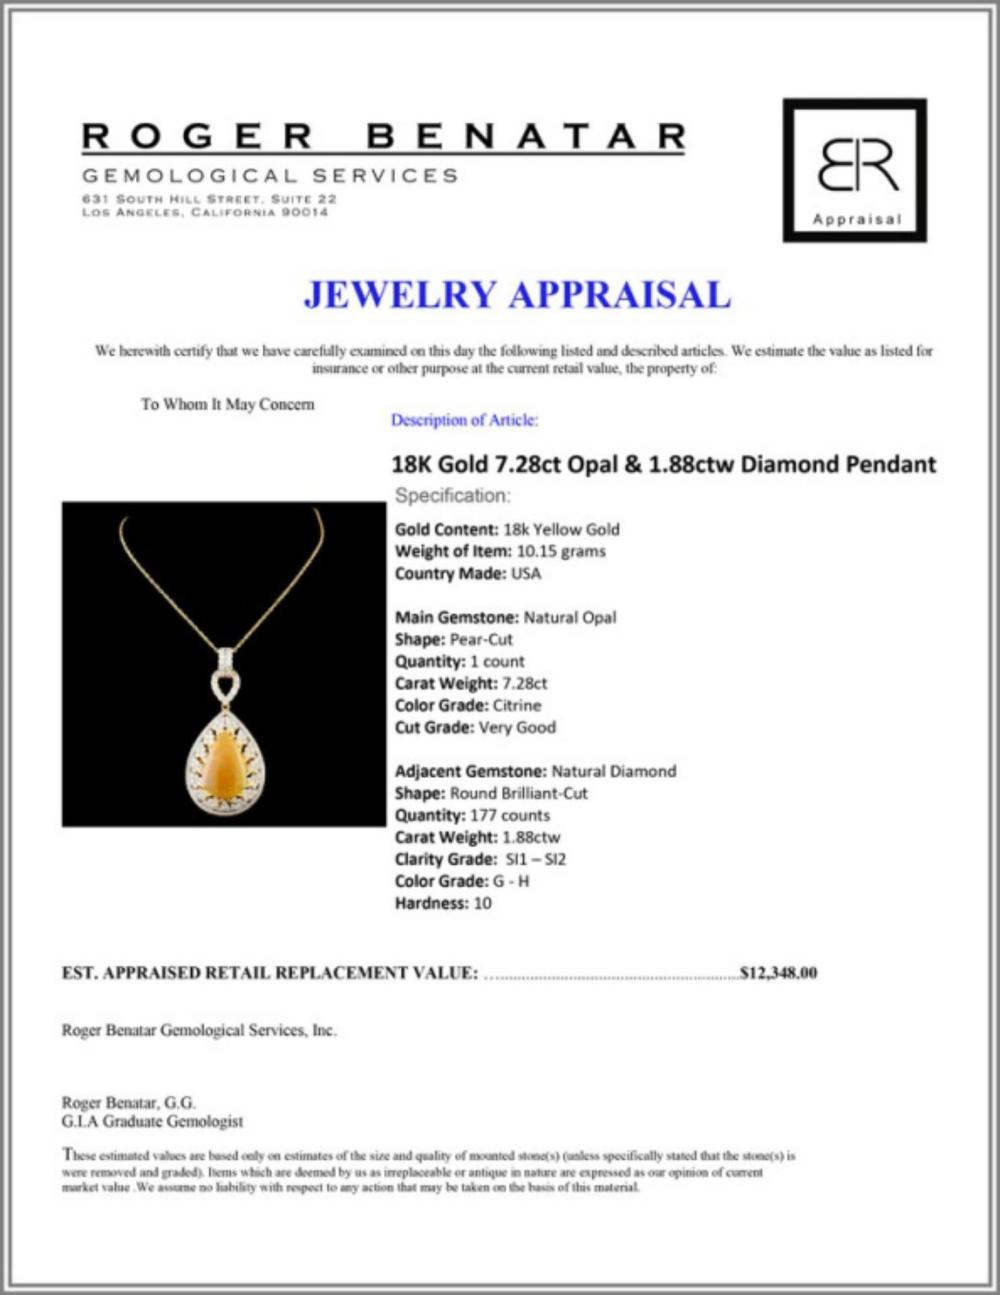 Lot 35: 18K Gold 7.28ct Opal & 1.88ctw Diamond Pendant